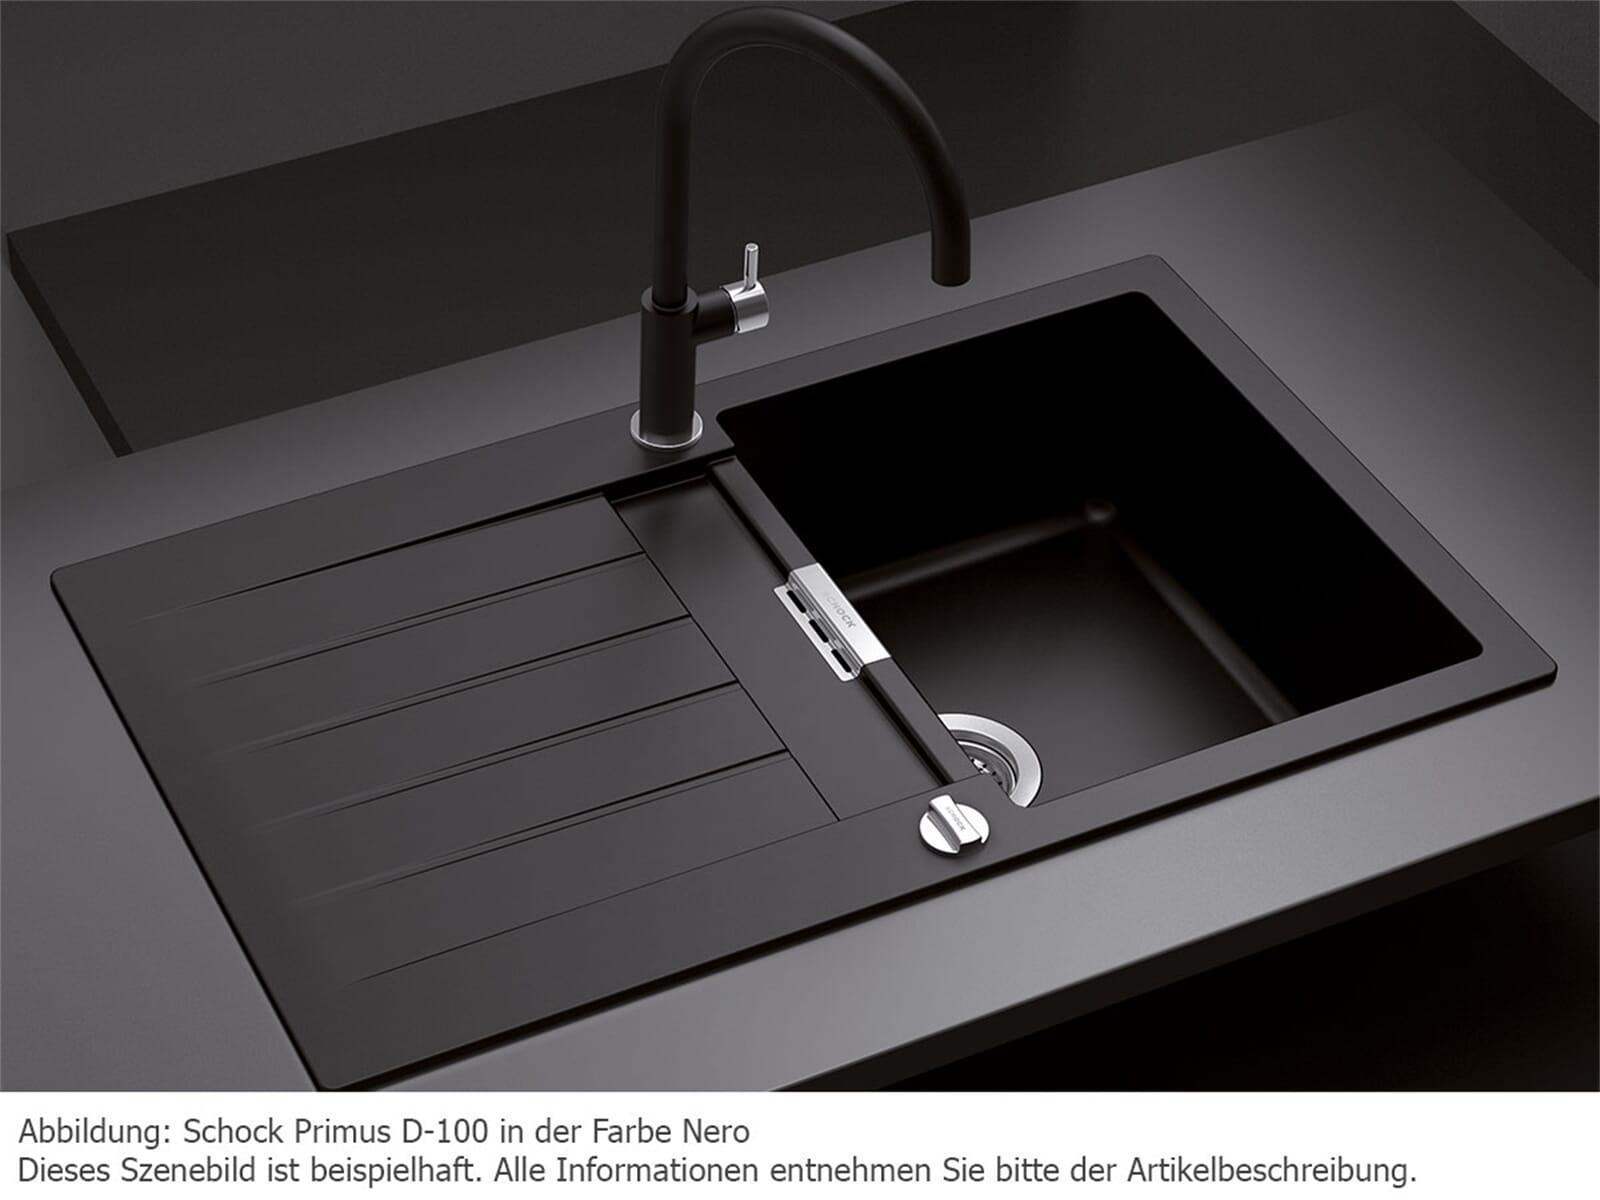 schock primus d 100 a nero granit sp le f r 188 90 eur. Black Bedroom Furniture Sets. Home Design Ideas